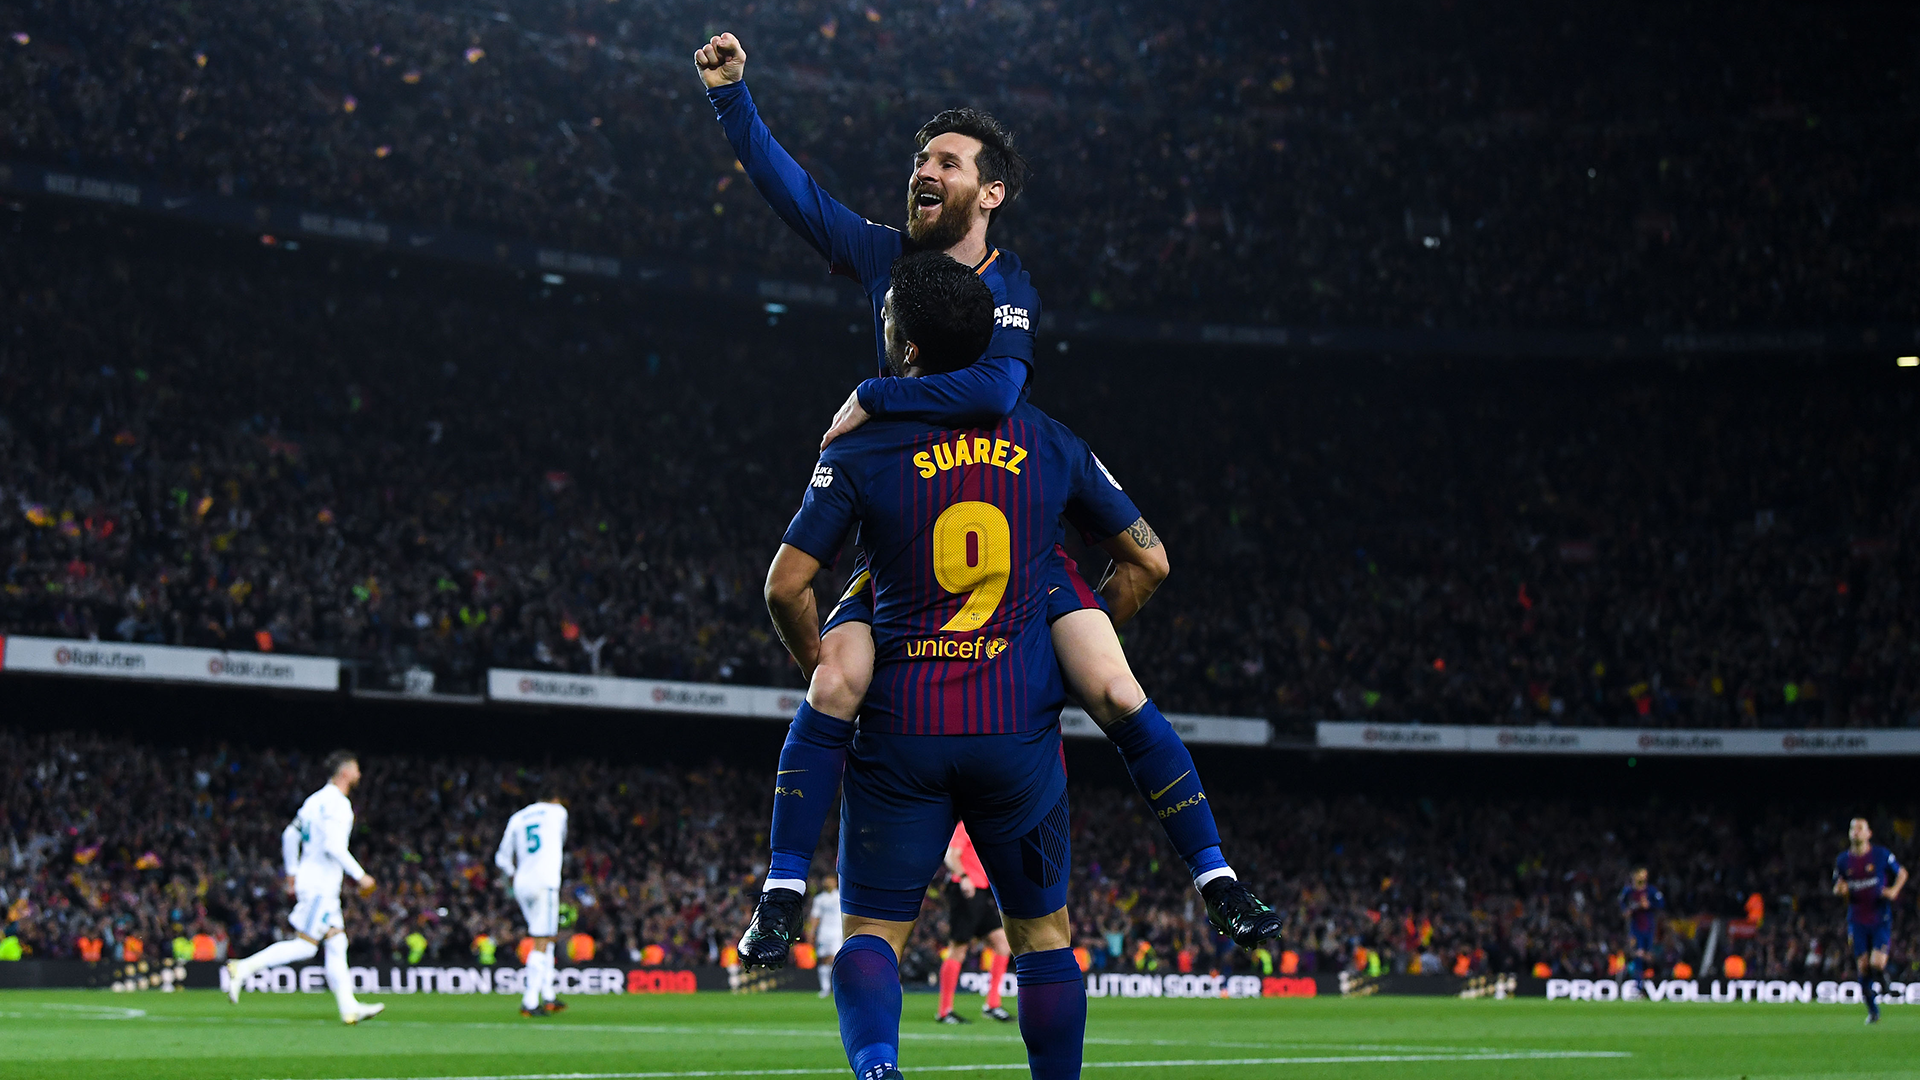 Lionel Messi Luis Suarez Barcelona Real Madrid 2017-18